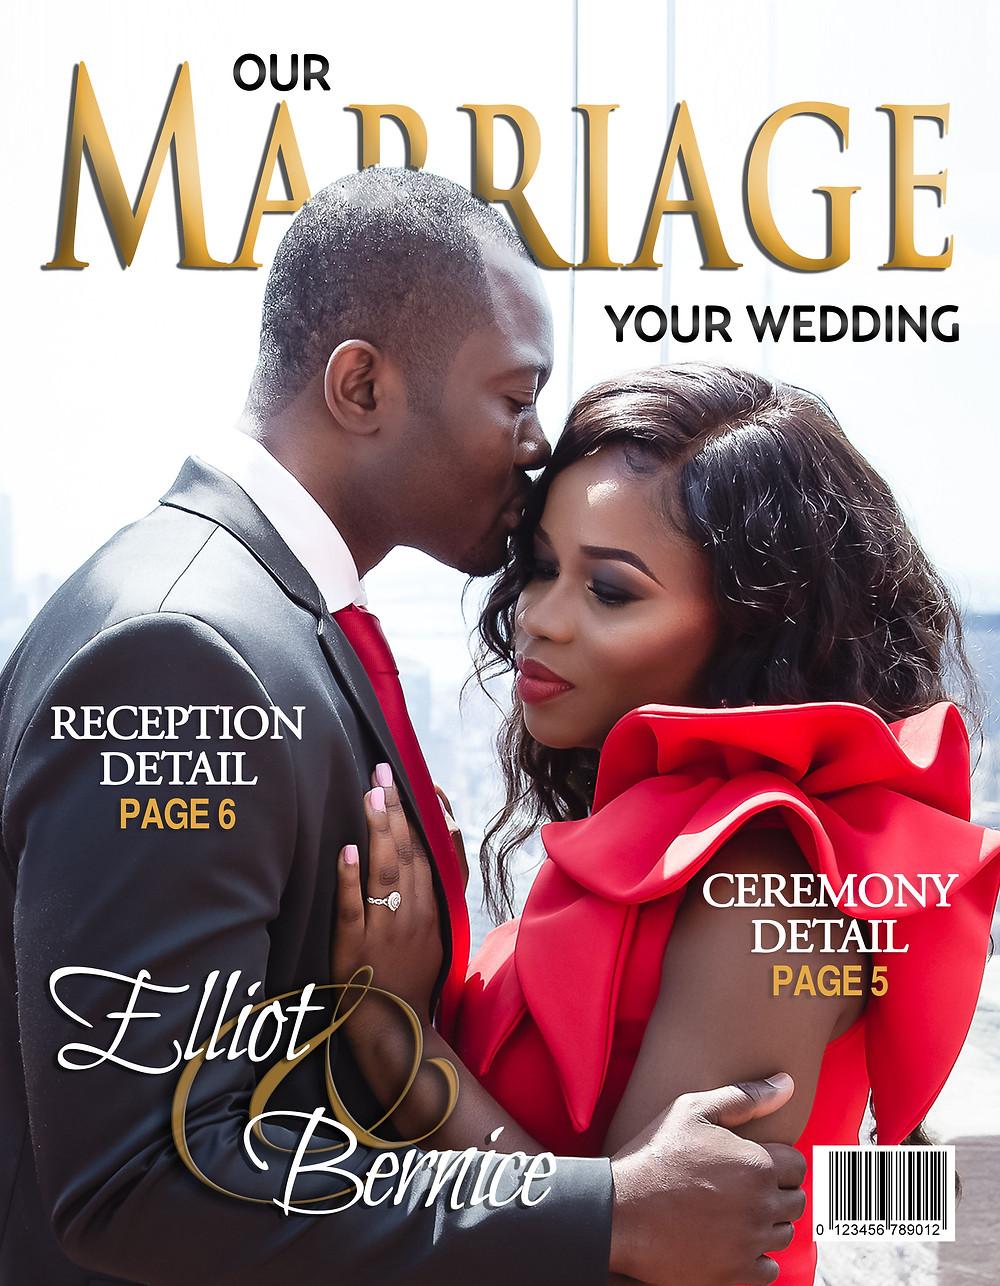 eTC. Couple Wedding Day Program